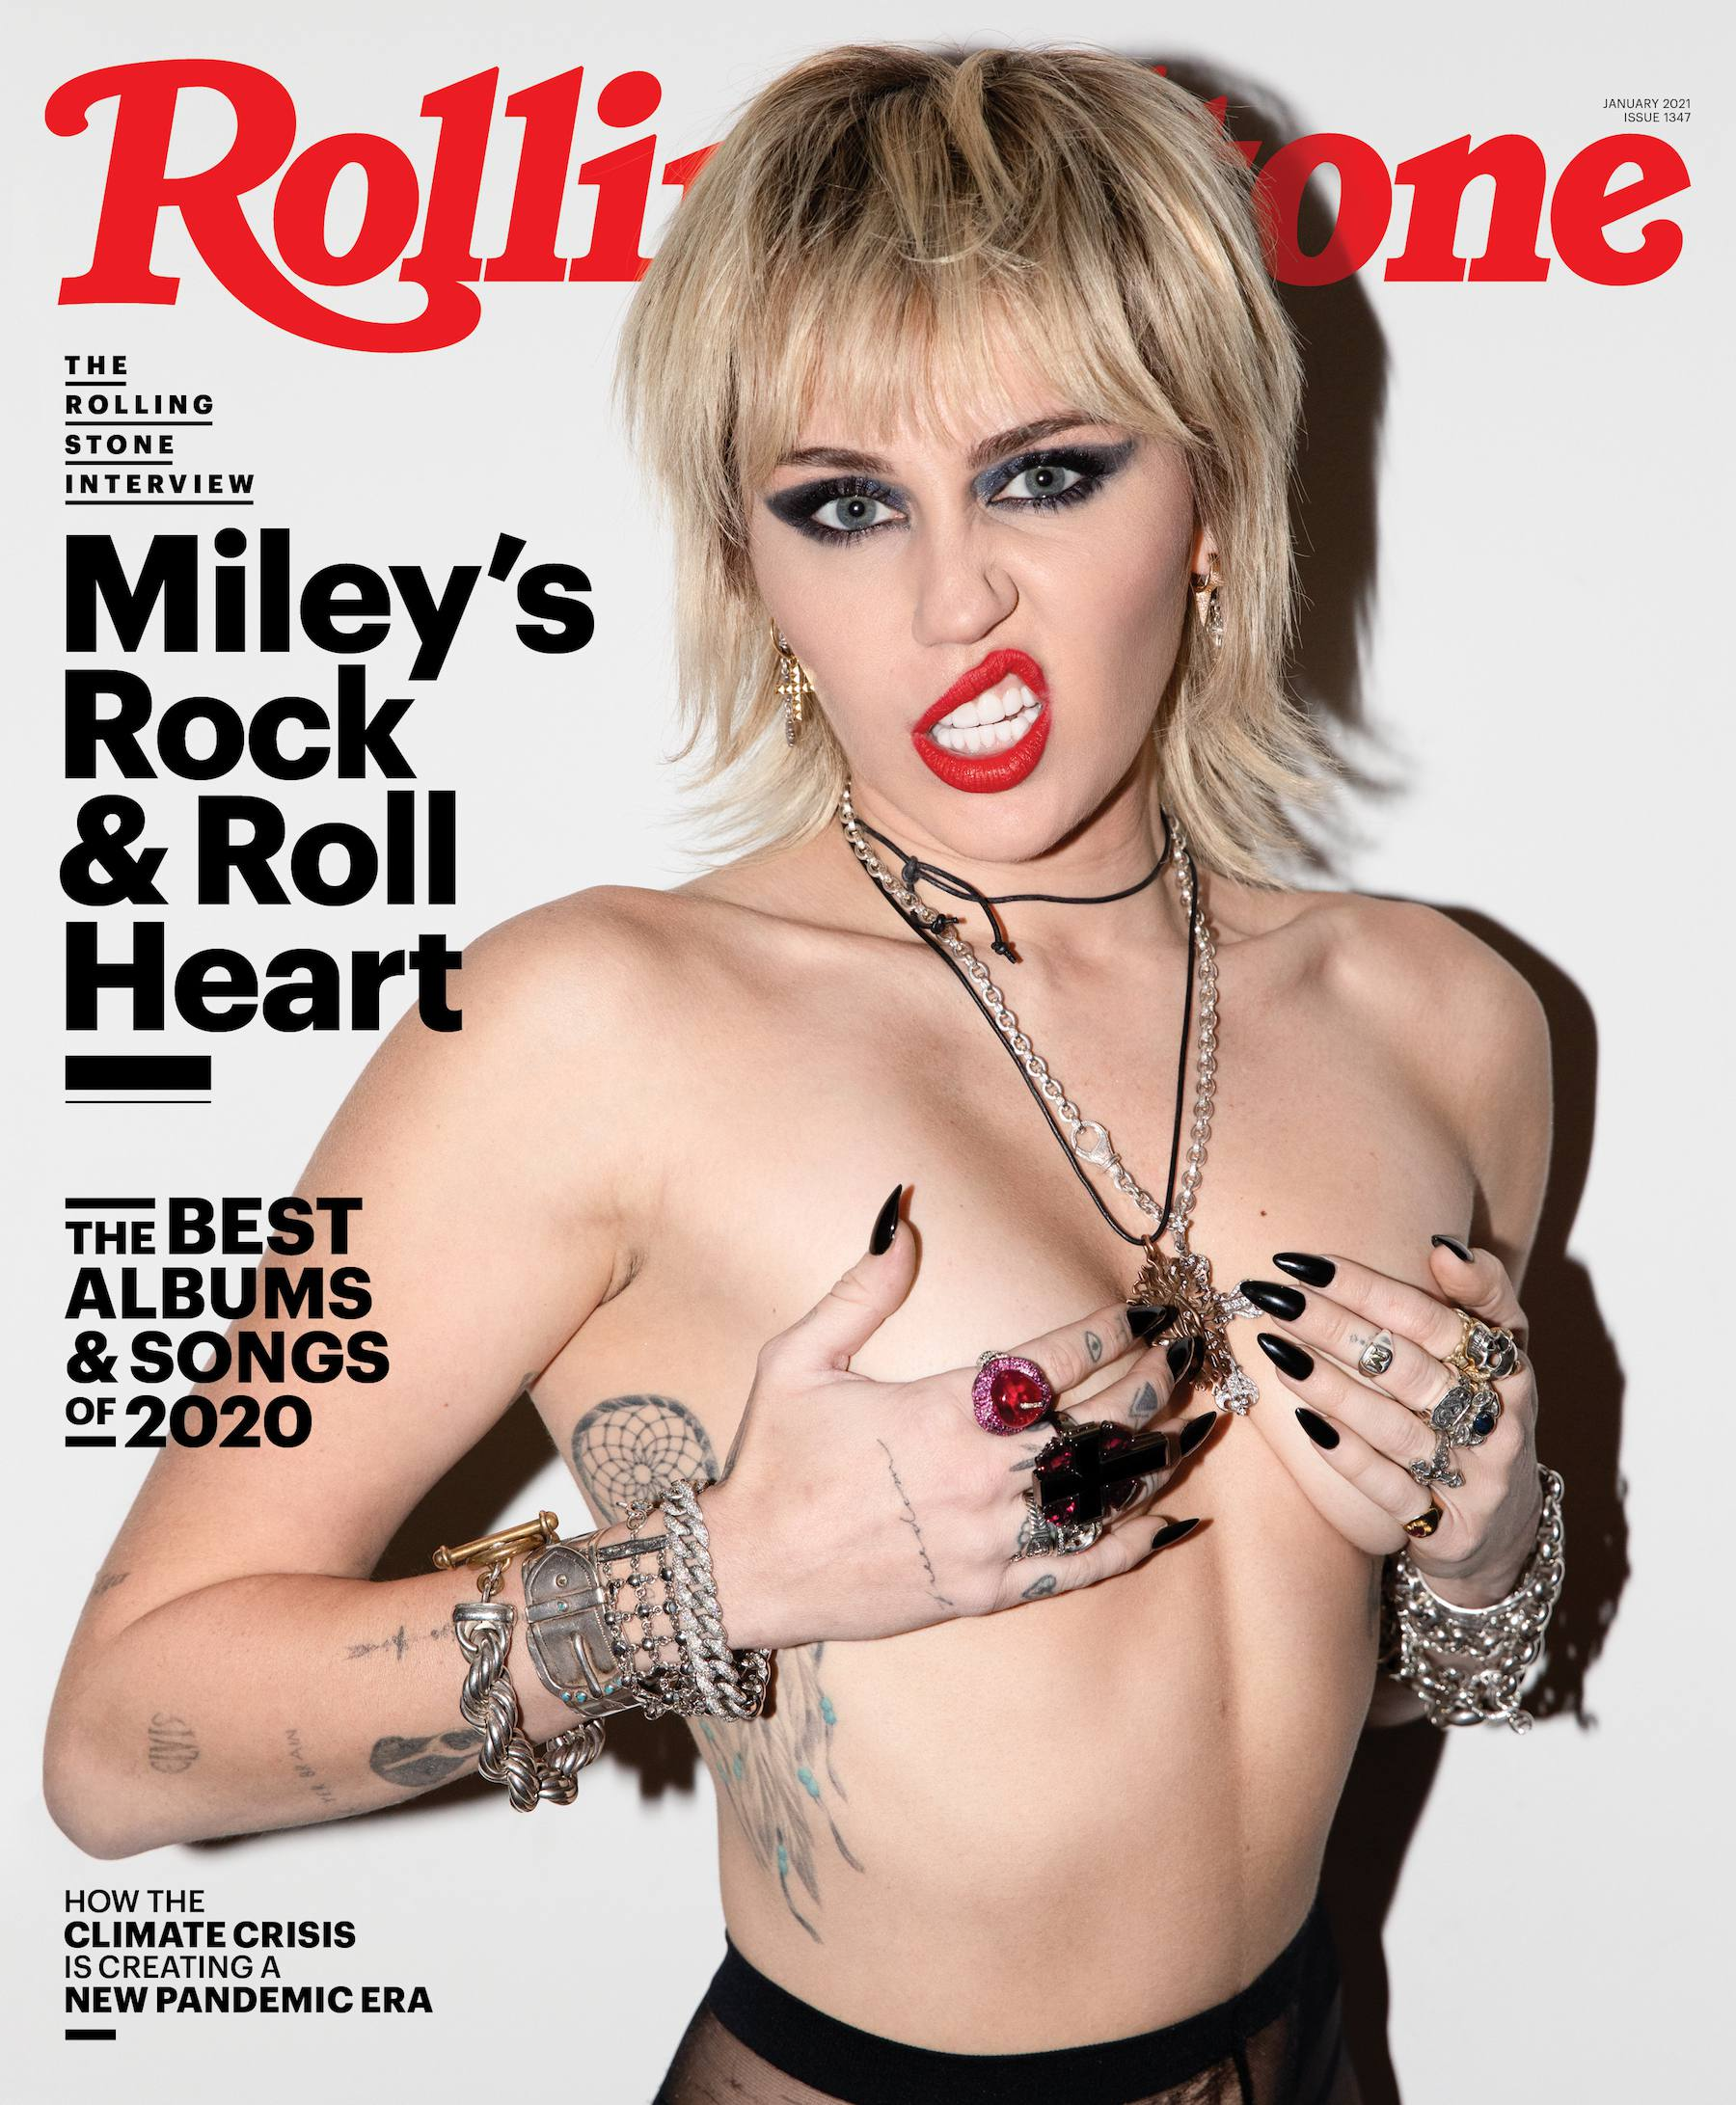 Miley Cyrus Topless Boobs